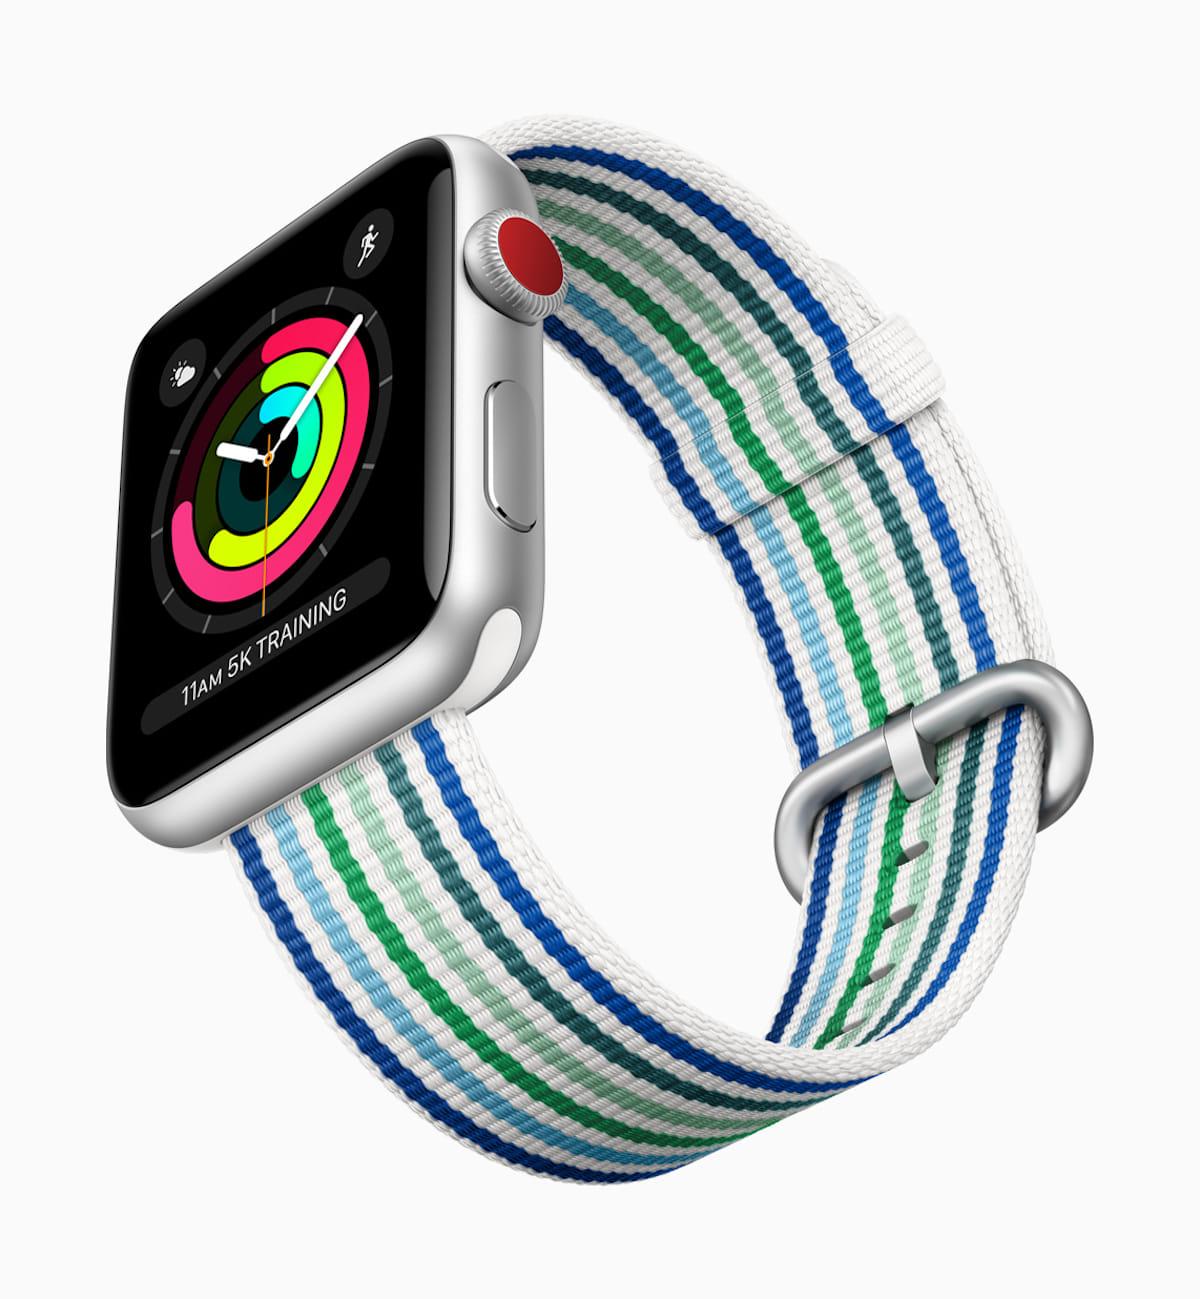 Apple WatchバンドがApple Storeで一部品切れに!新Apple Watch、バンド登場の予兆か? technology180322_applewatch_5-1200x1299